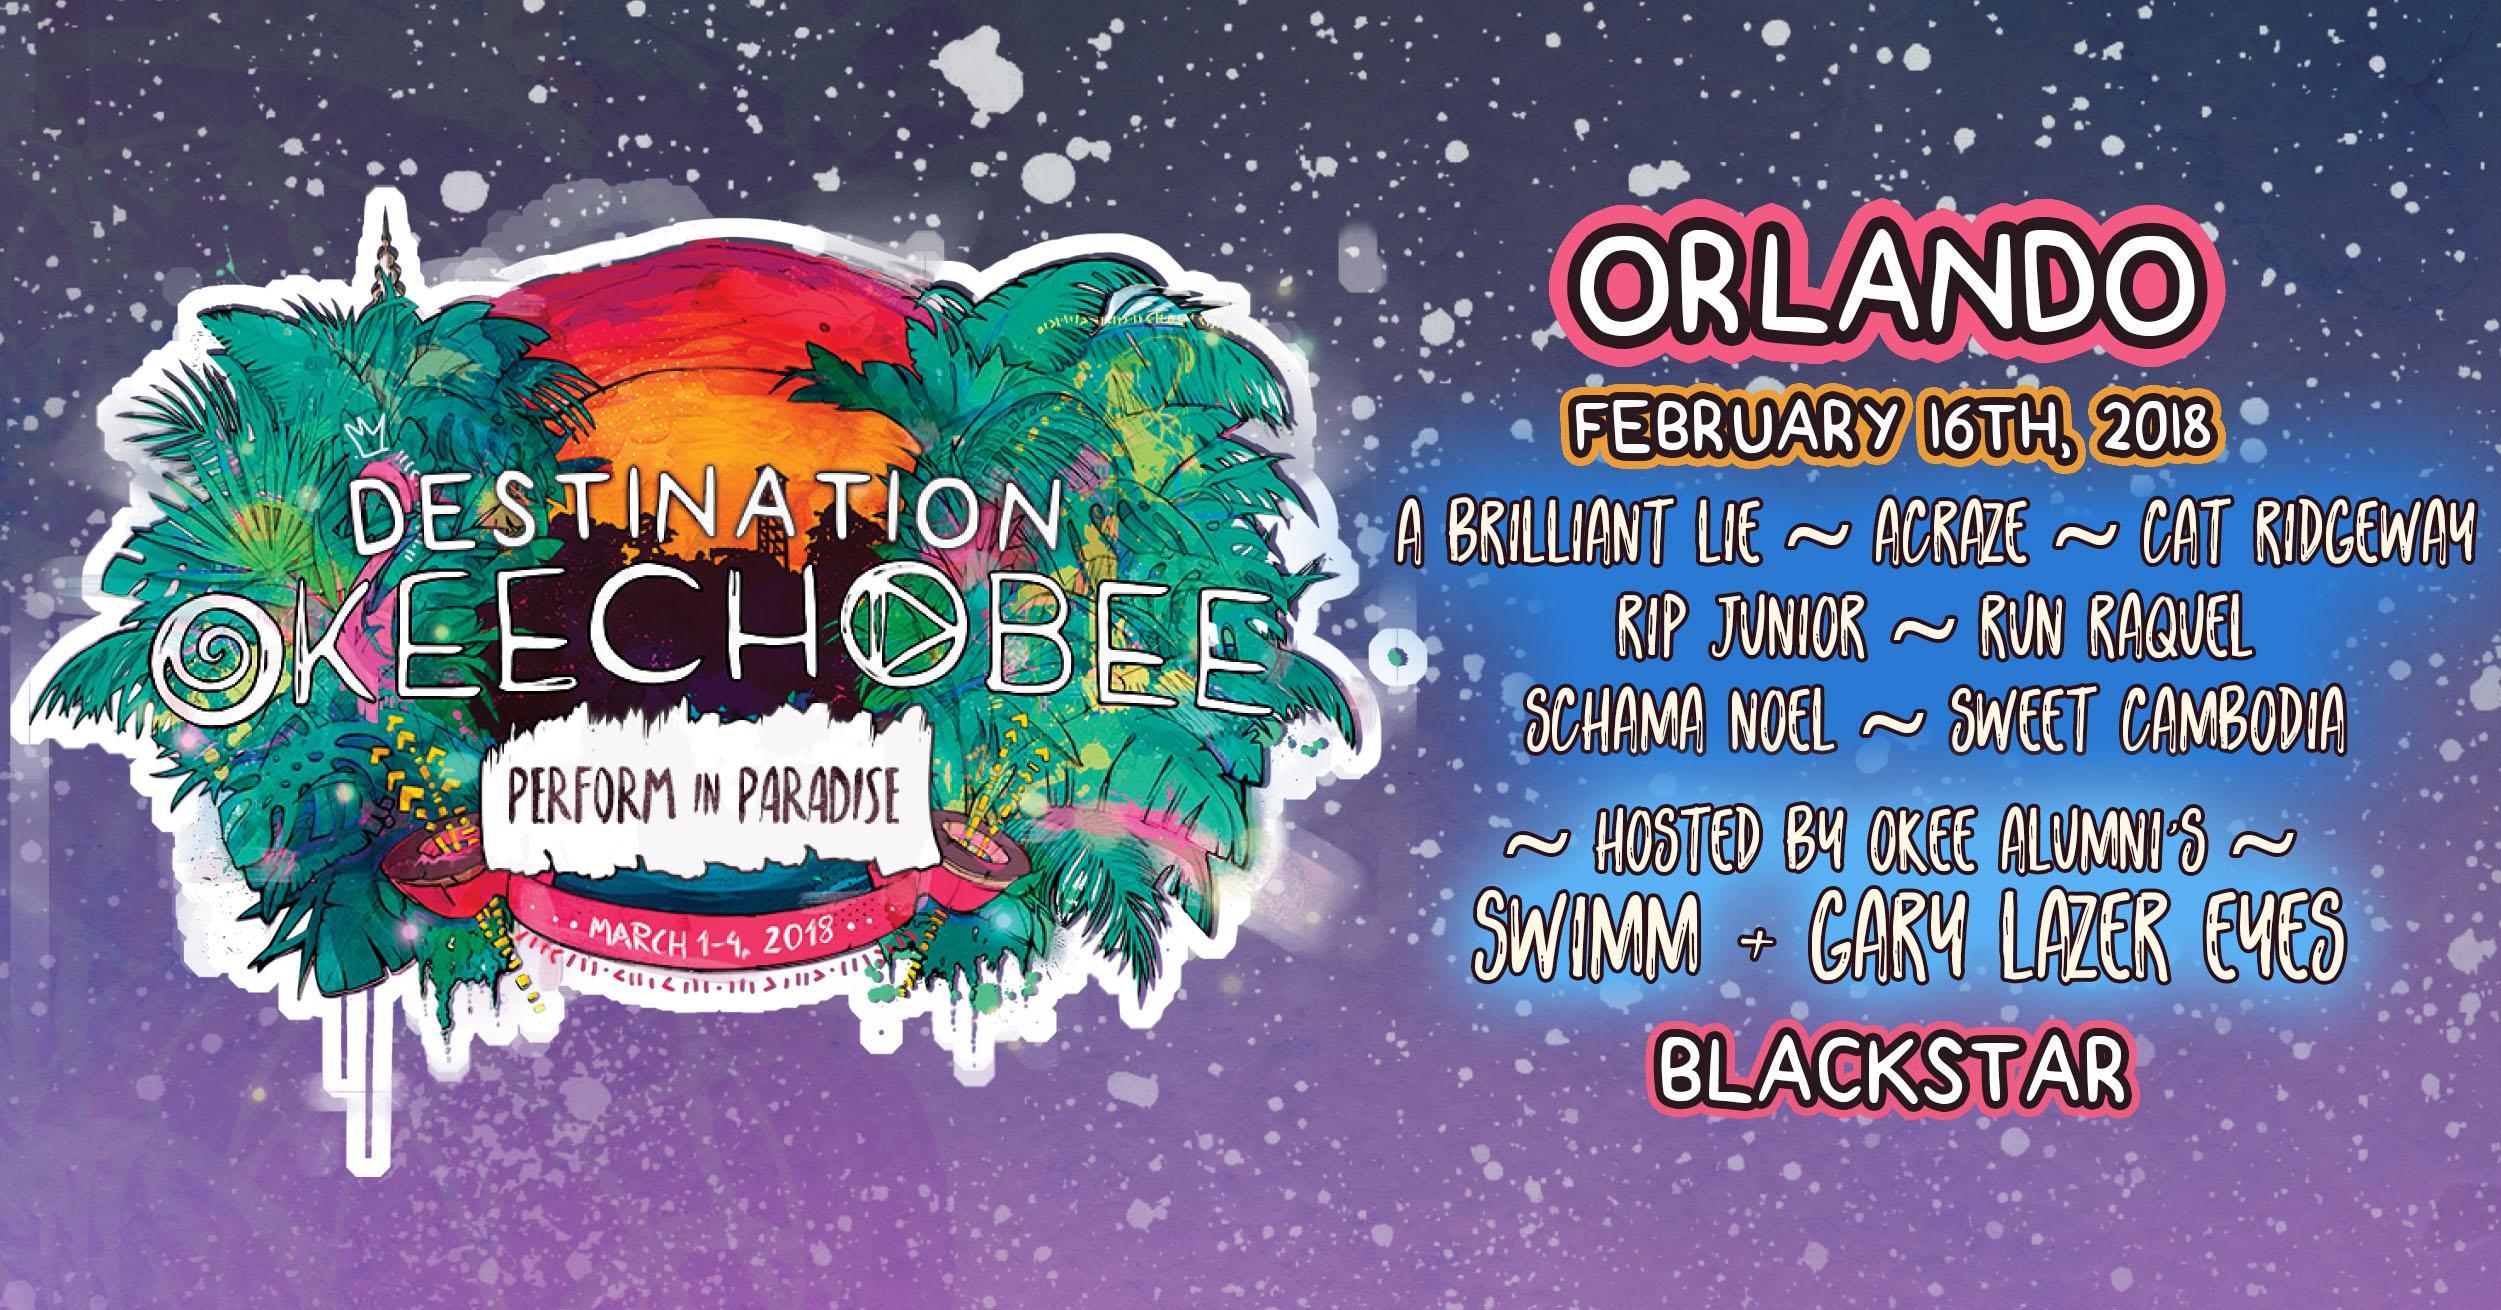 Destination Okeechobee with SWIMM & Gary Lazer Eyes Blackstar